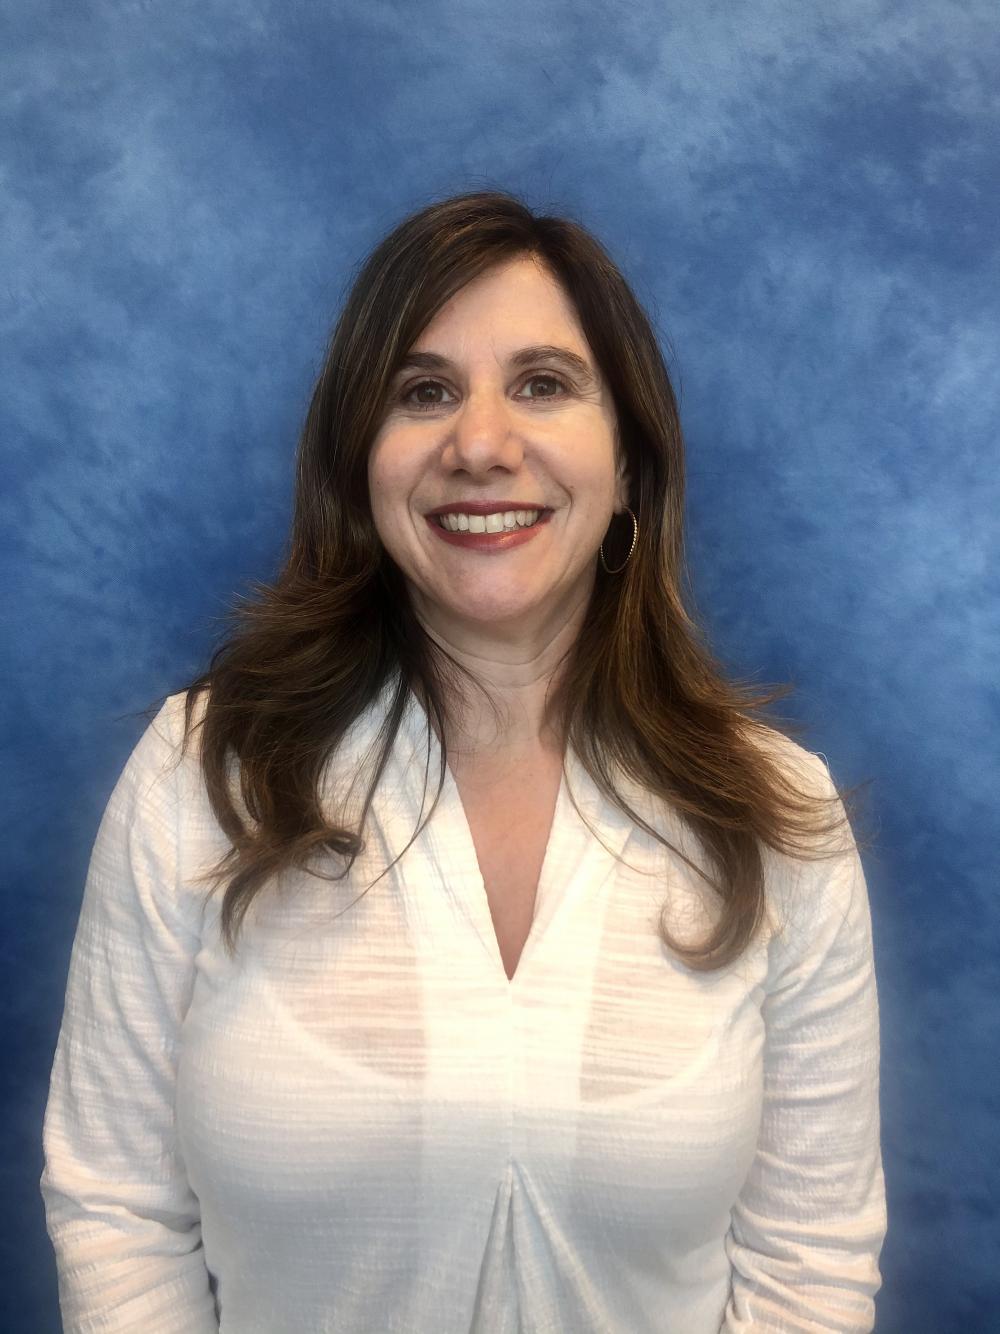 Dr. Caterina Lerede